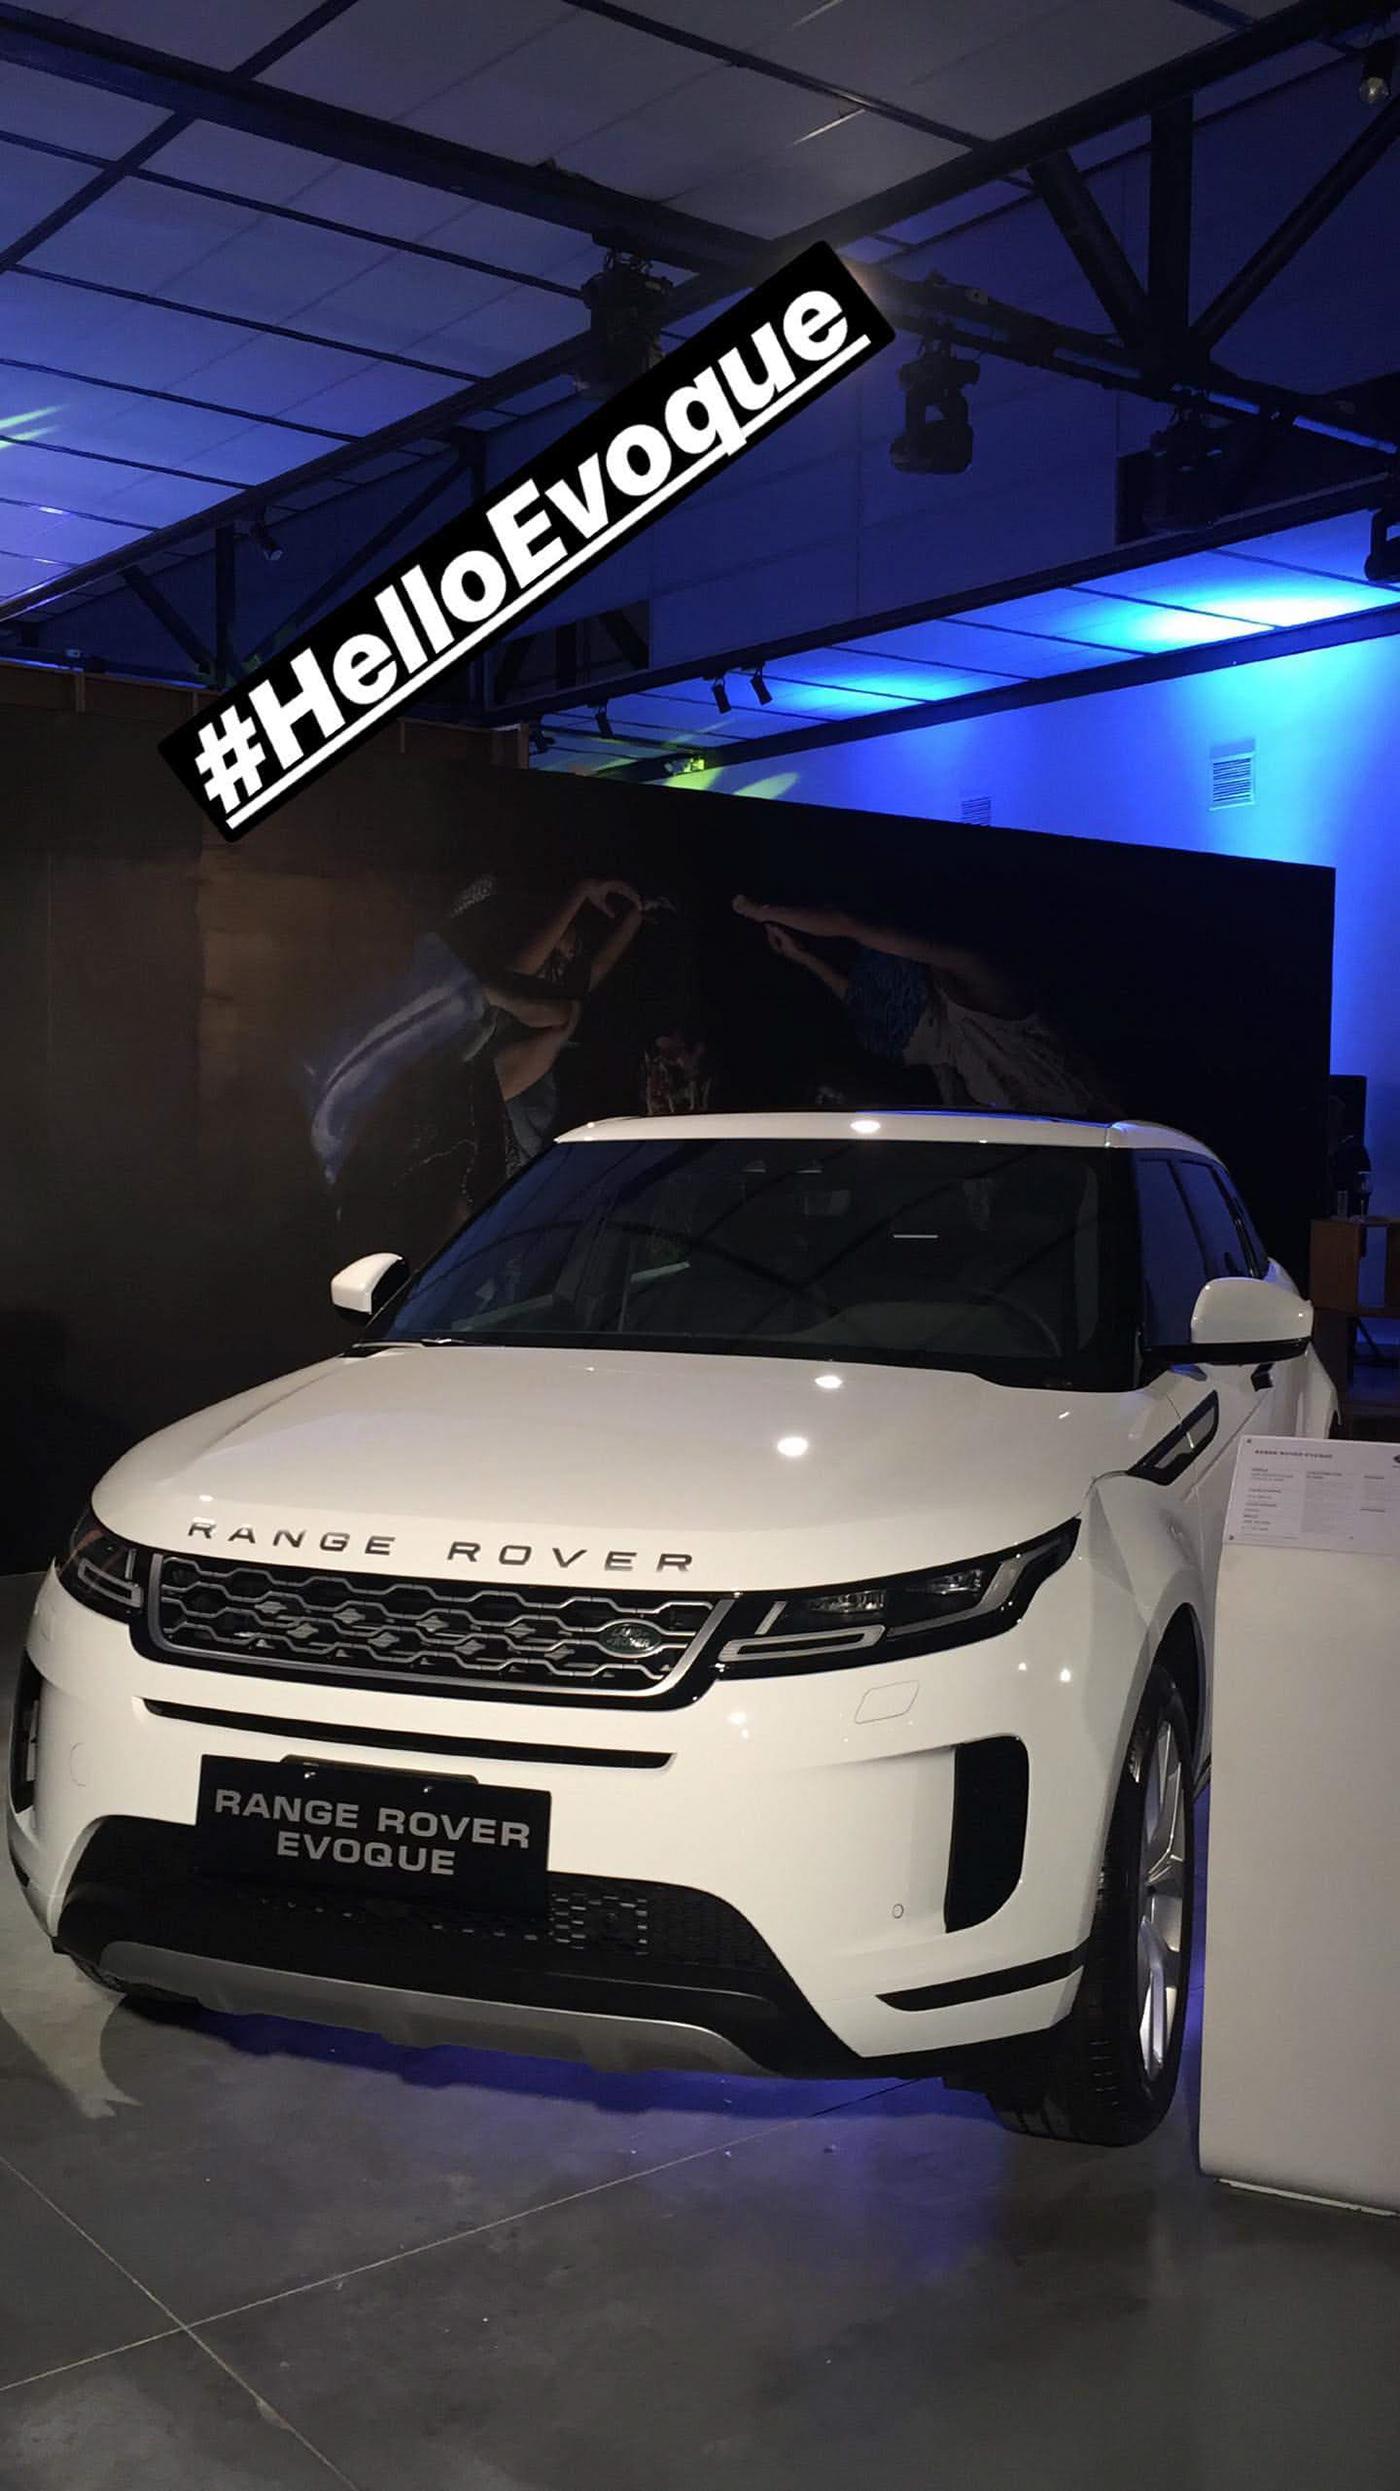 Range Rover Evoque on Pantone Canvas Gallery